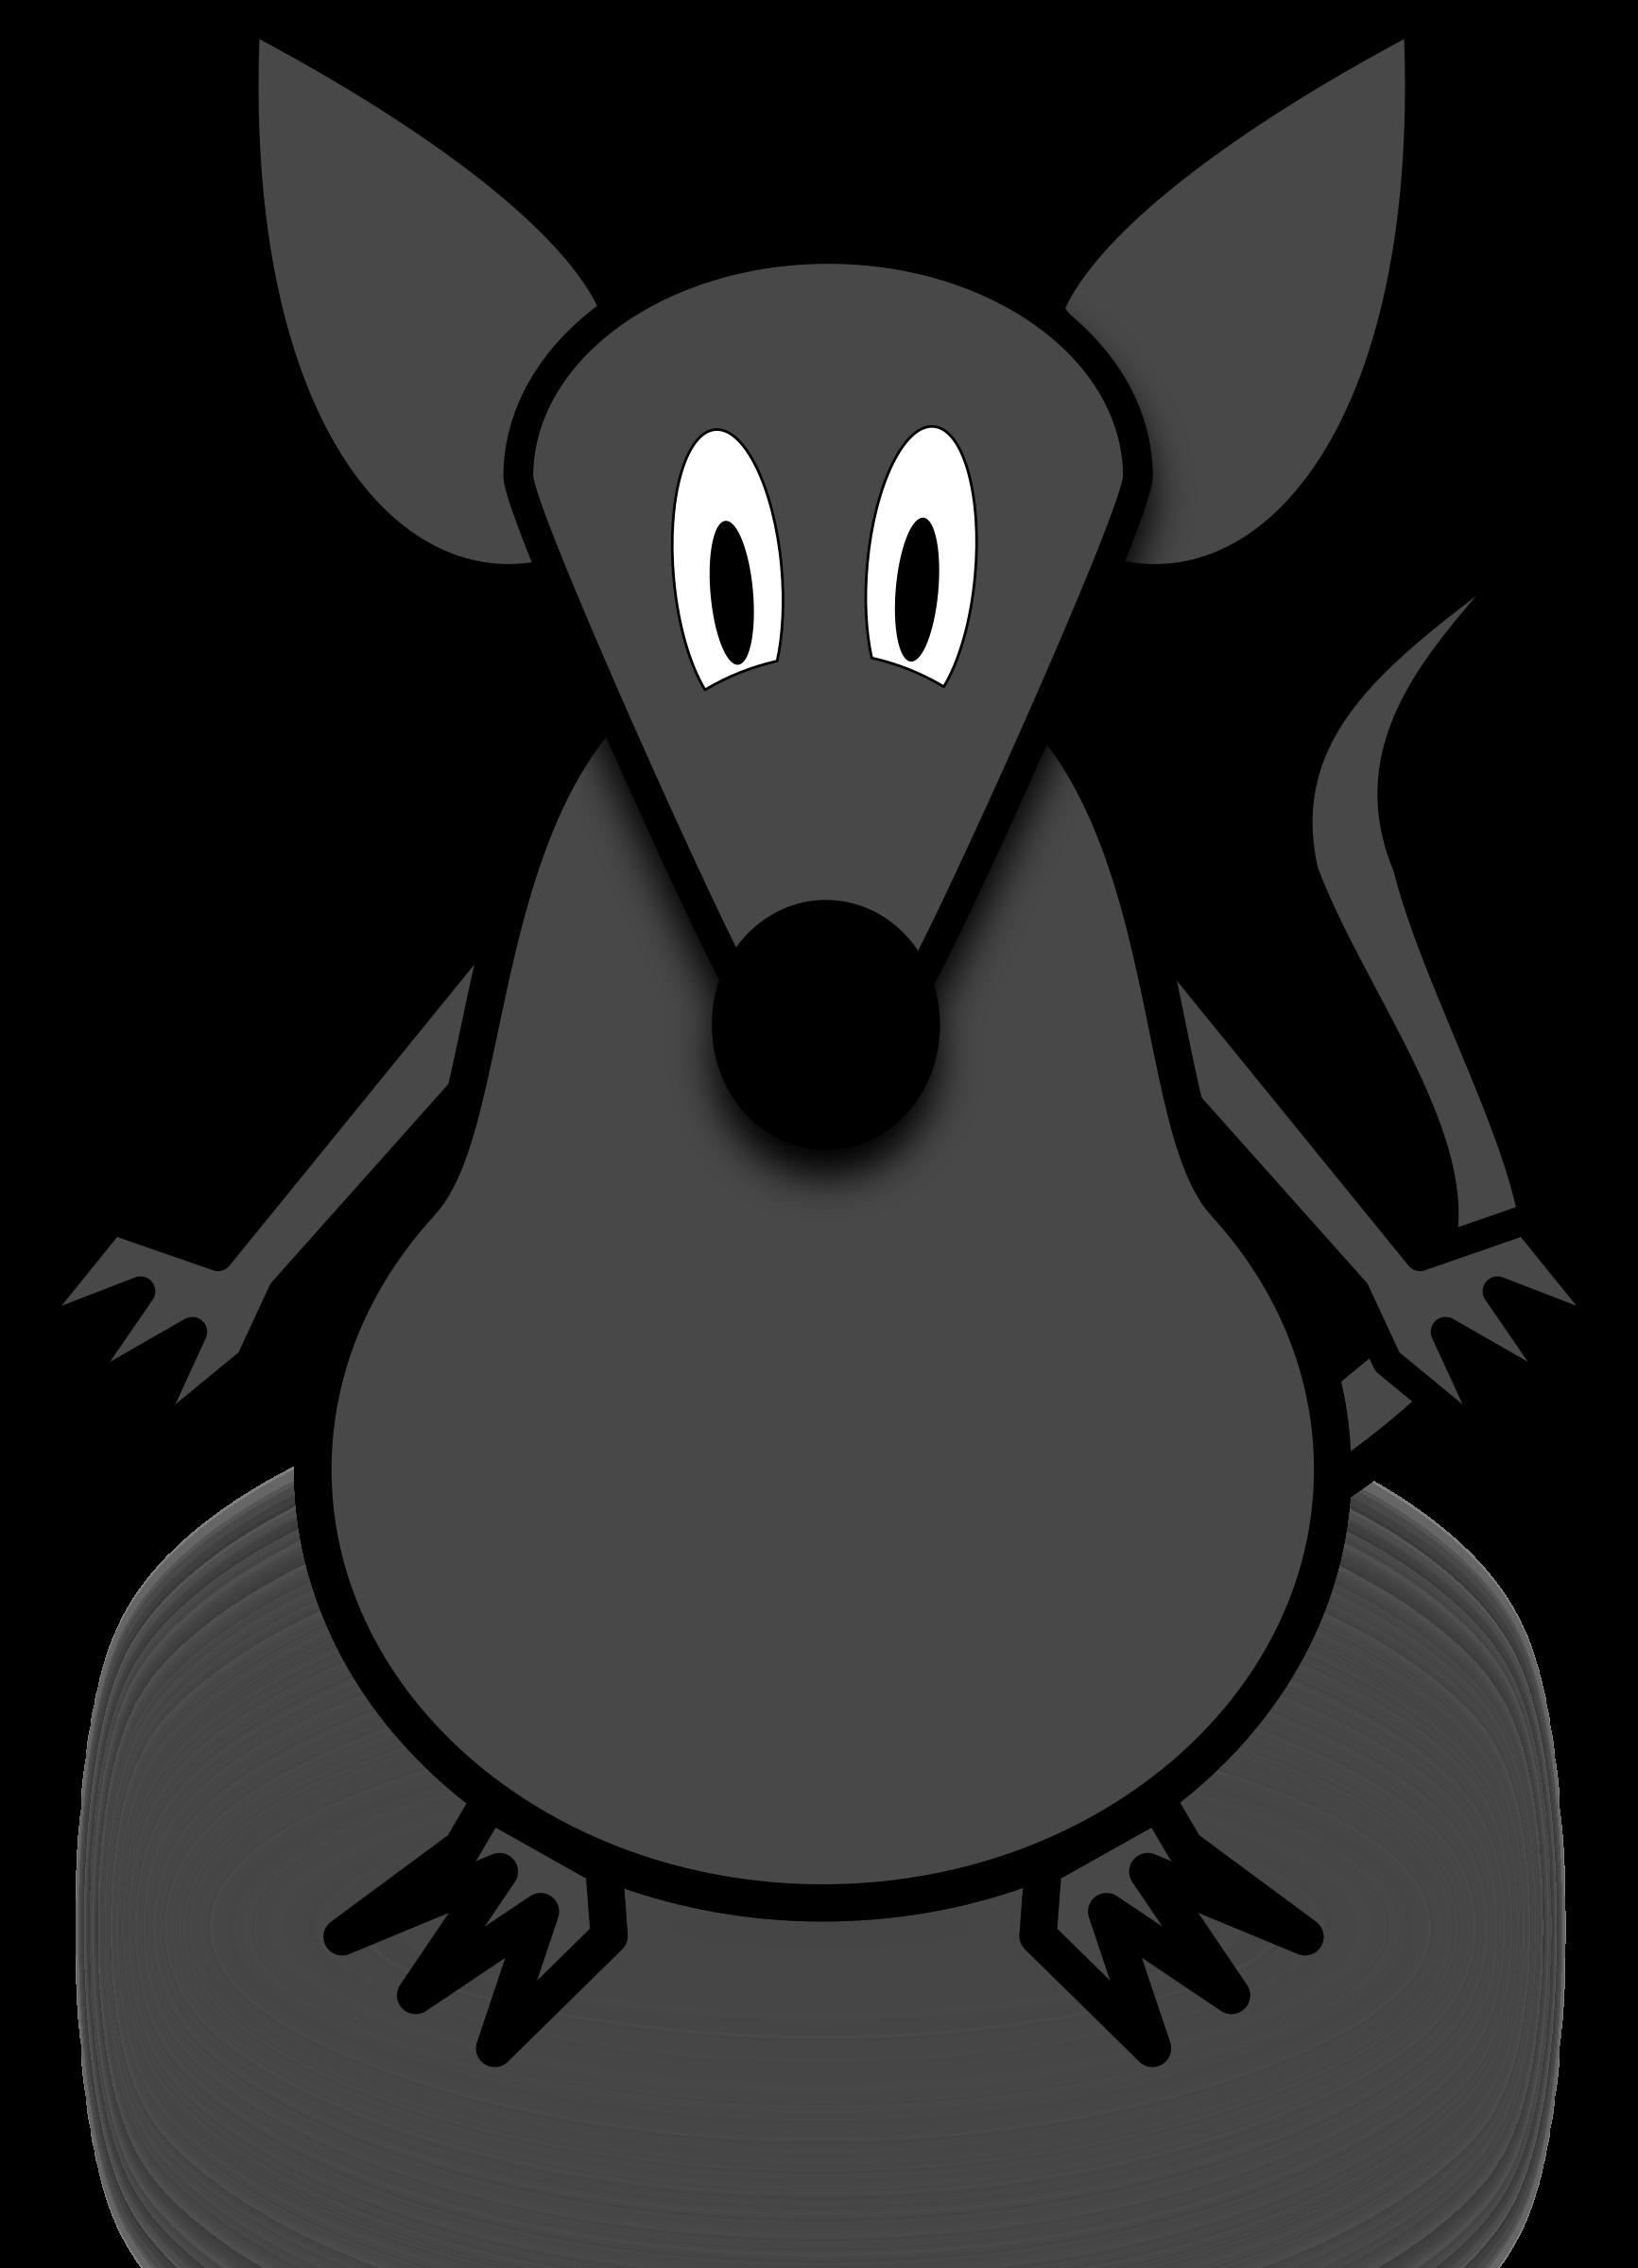 Mouse big image png. Clipart rat simple